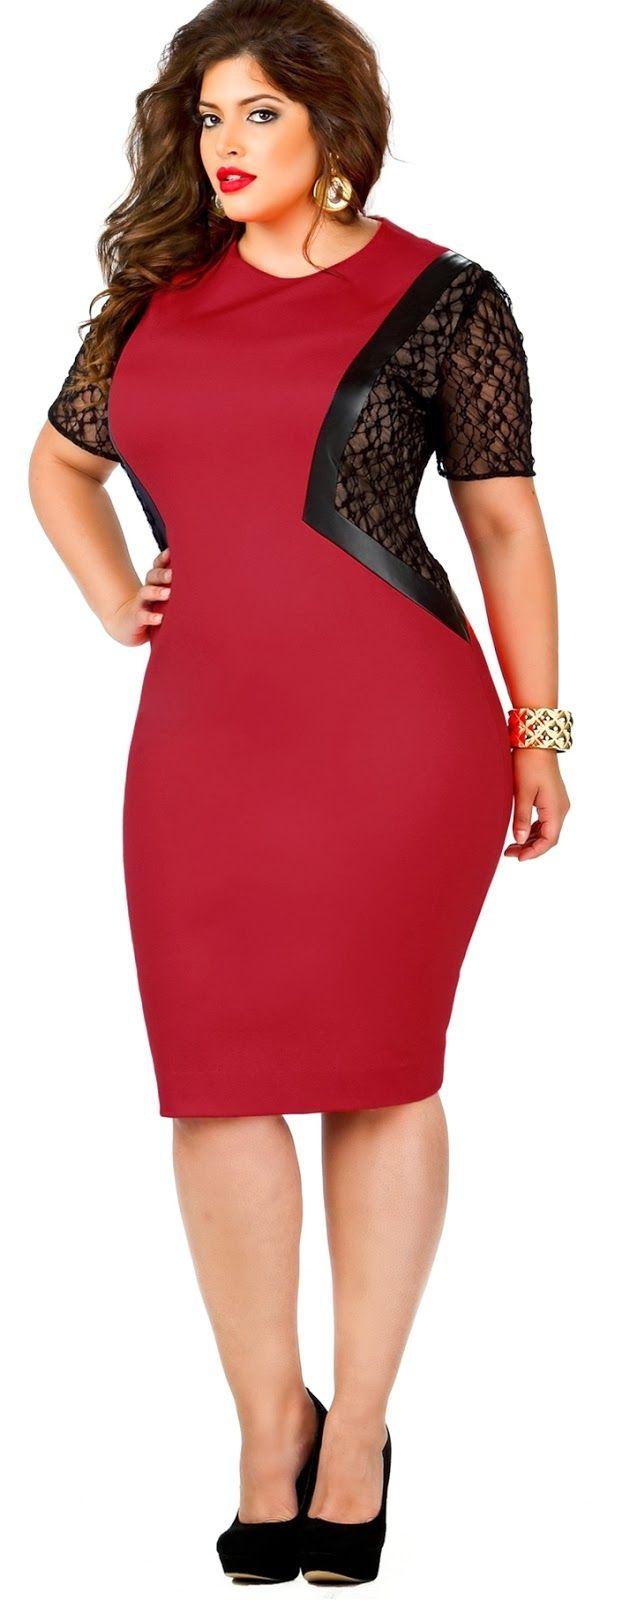 Fabulous plus size mini dress fashion for women | Fashion Idea